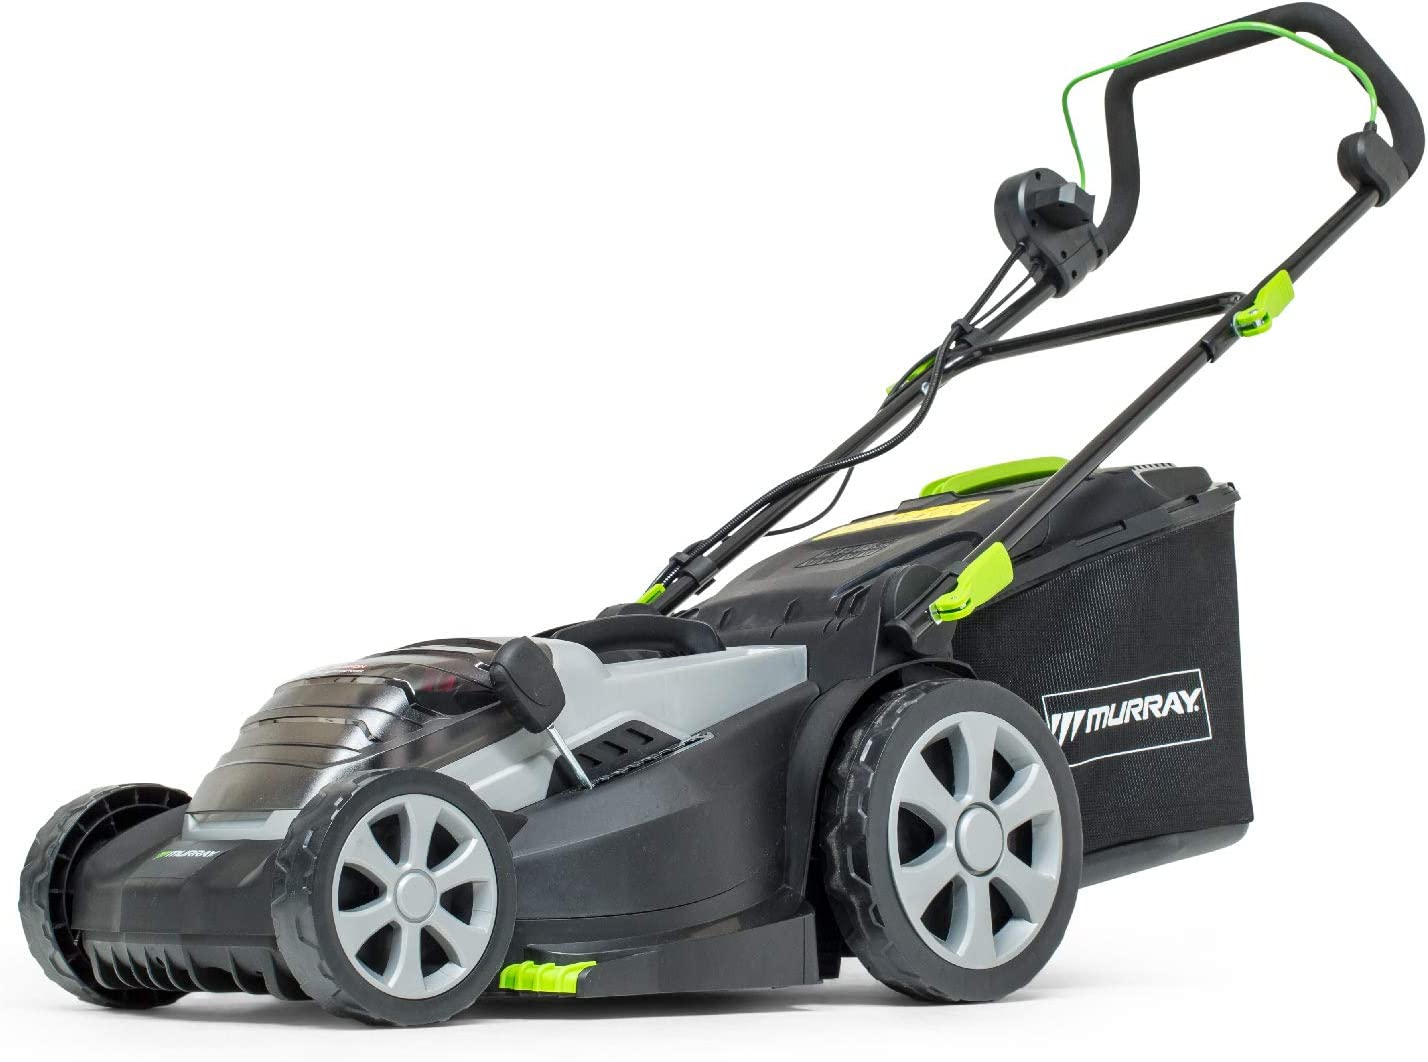 best Murray IQ18WM37 Lawn Mower